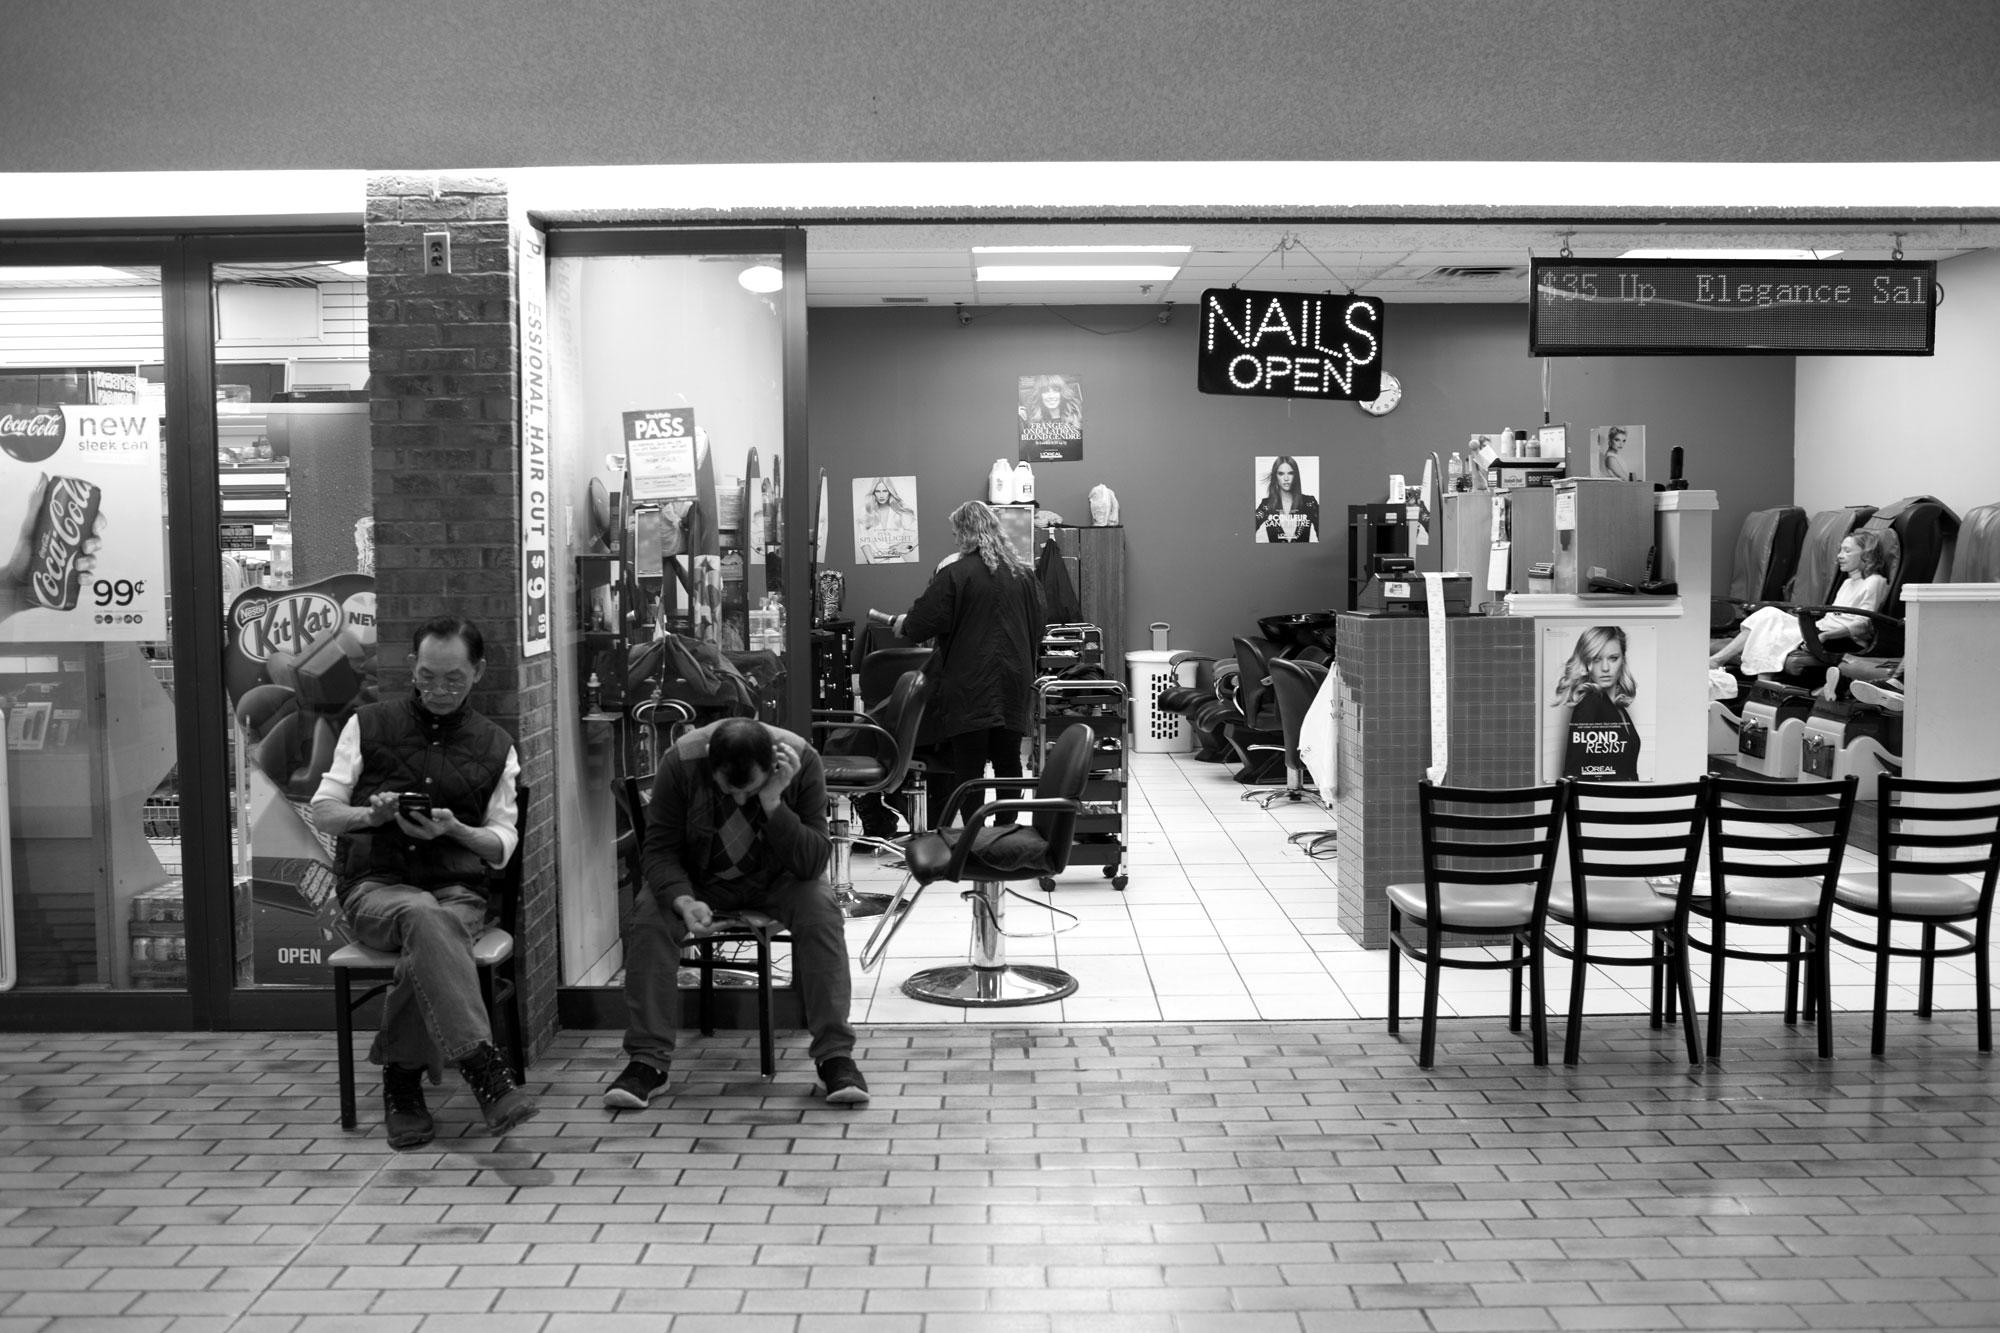 West-End-Phoenix-Feb2018-Galleria-Mall-Jeff-Harris-6.jpg